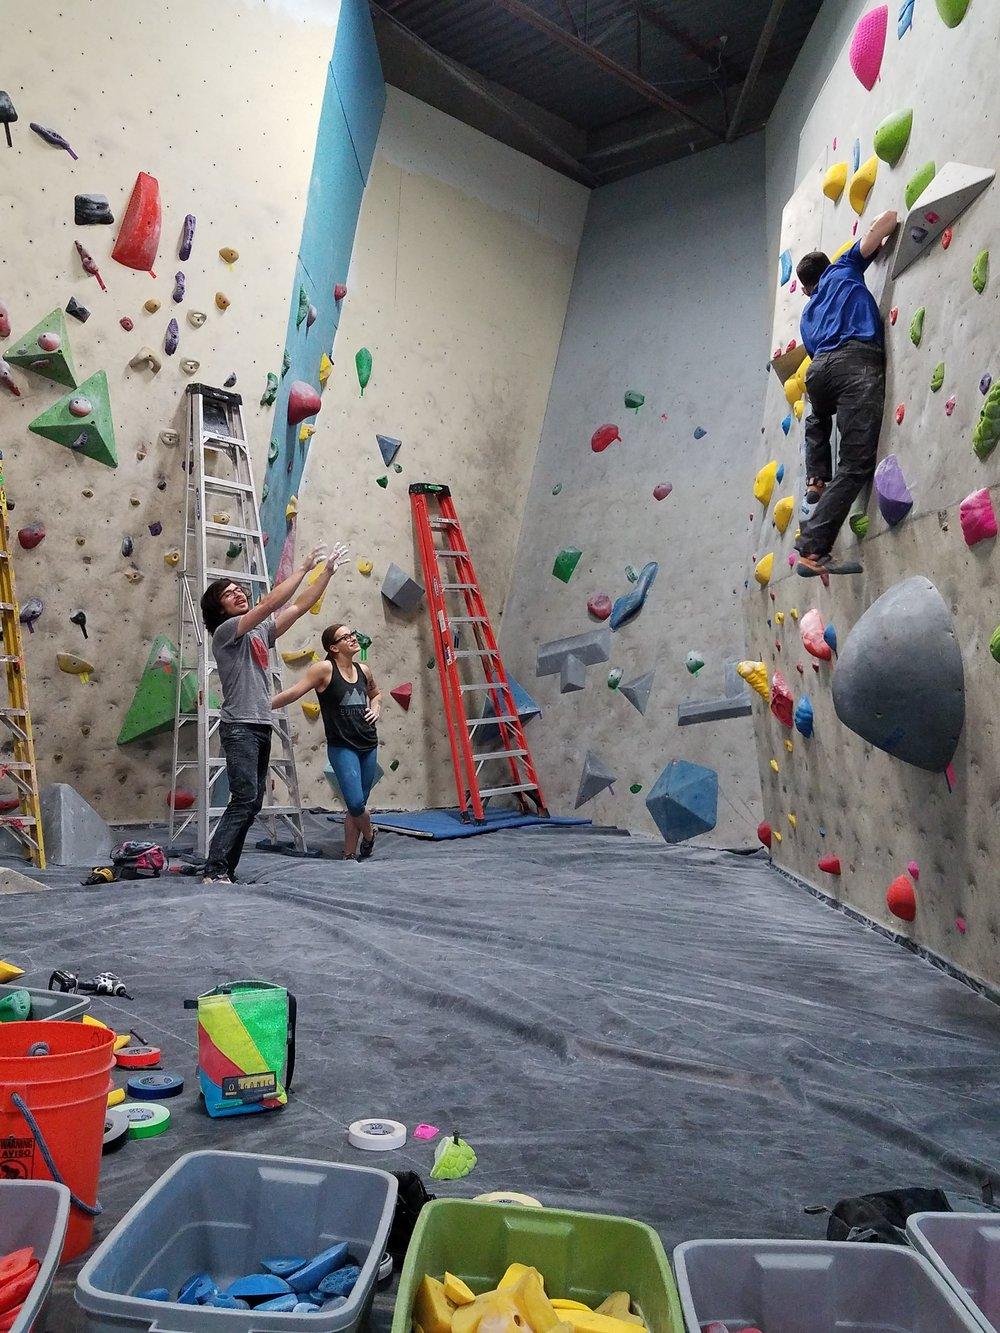 Photo by www.summitgyms.com